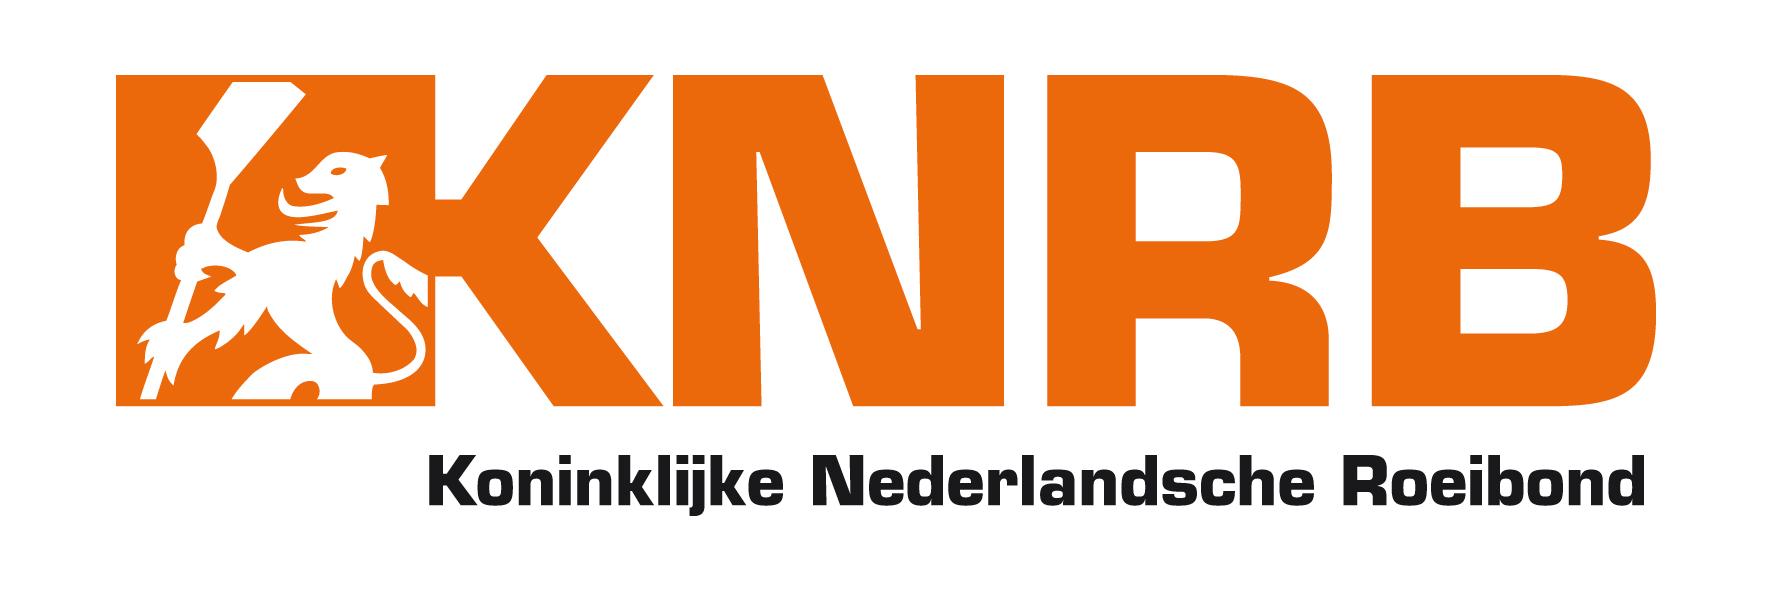 Koninklijke Nederlandse Roeibond